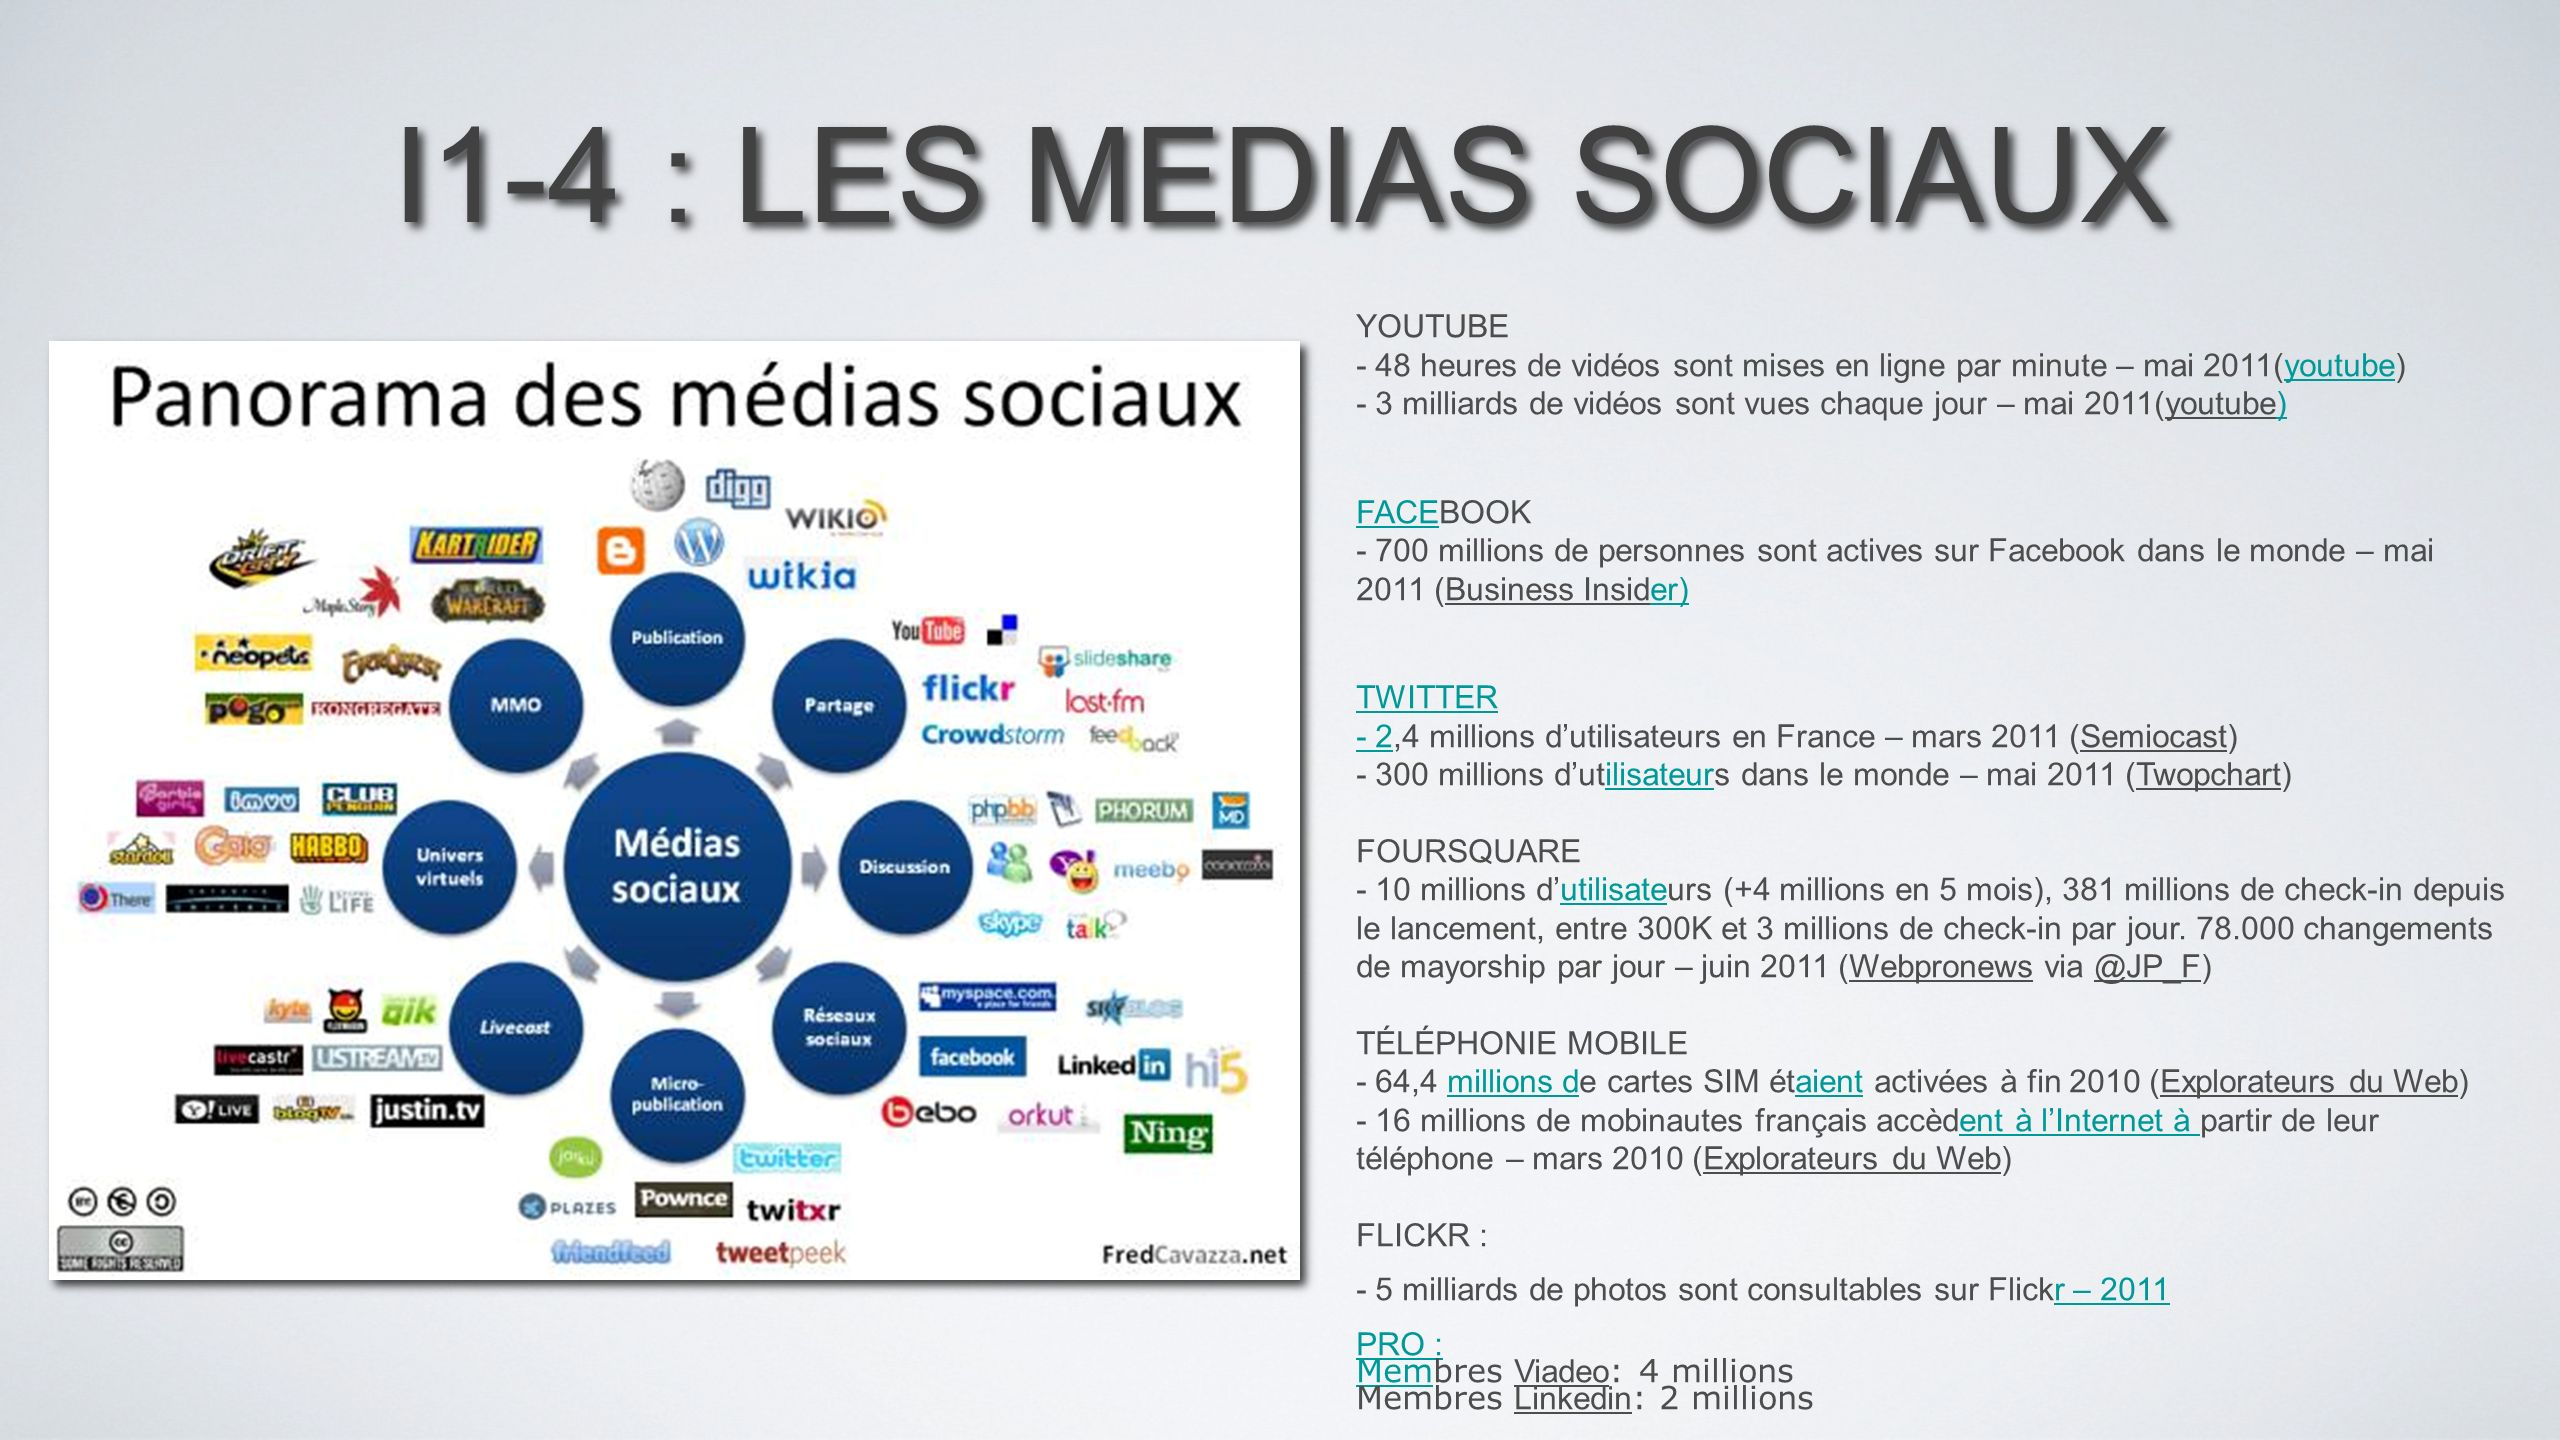 I1-4 : LES MEDIAS SOCIAUX